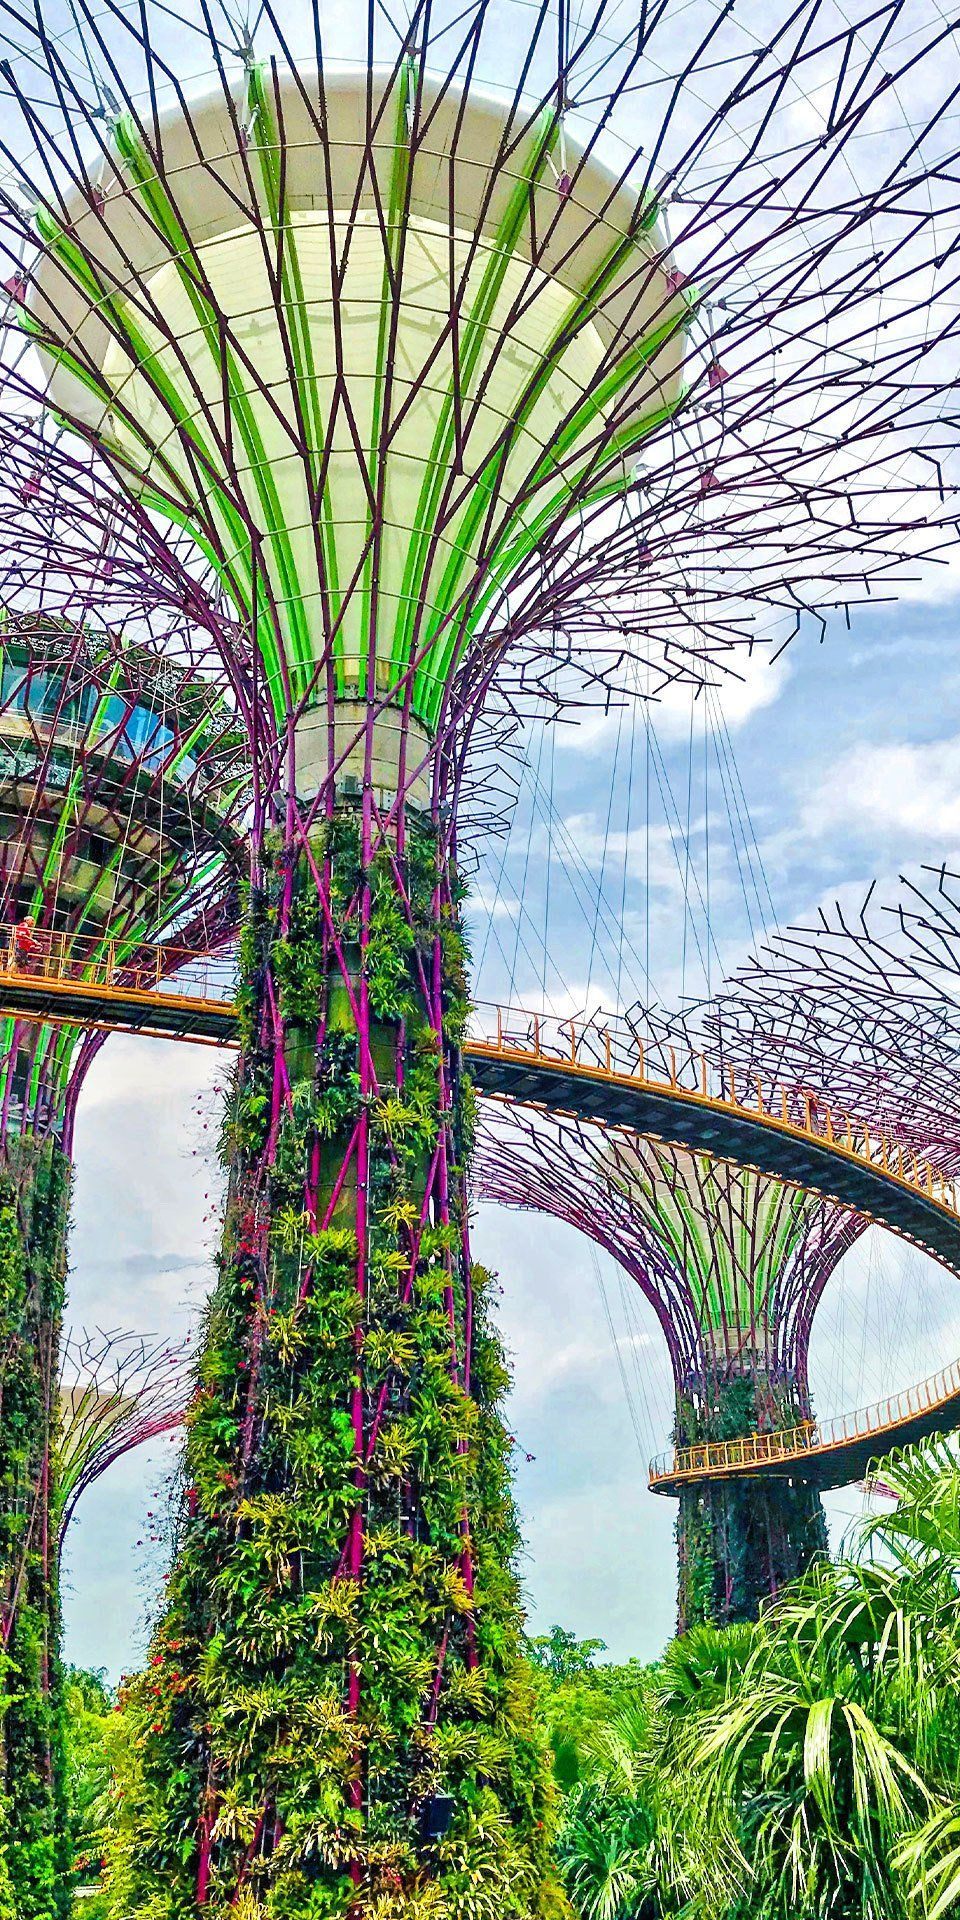 Singapore, Singapore The Singapore Botanic Garden (and